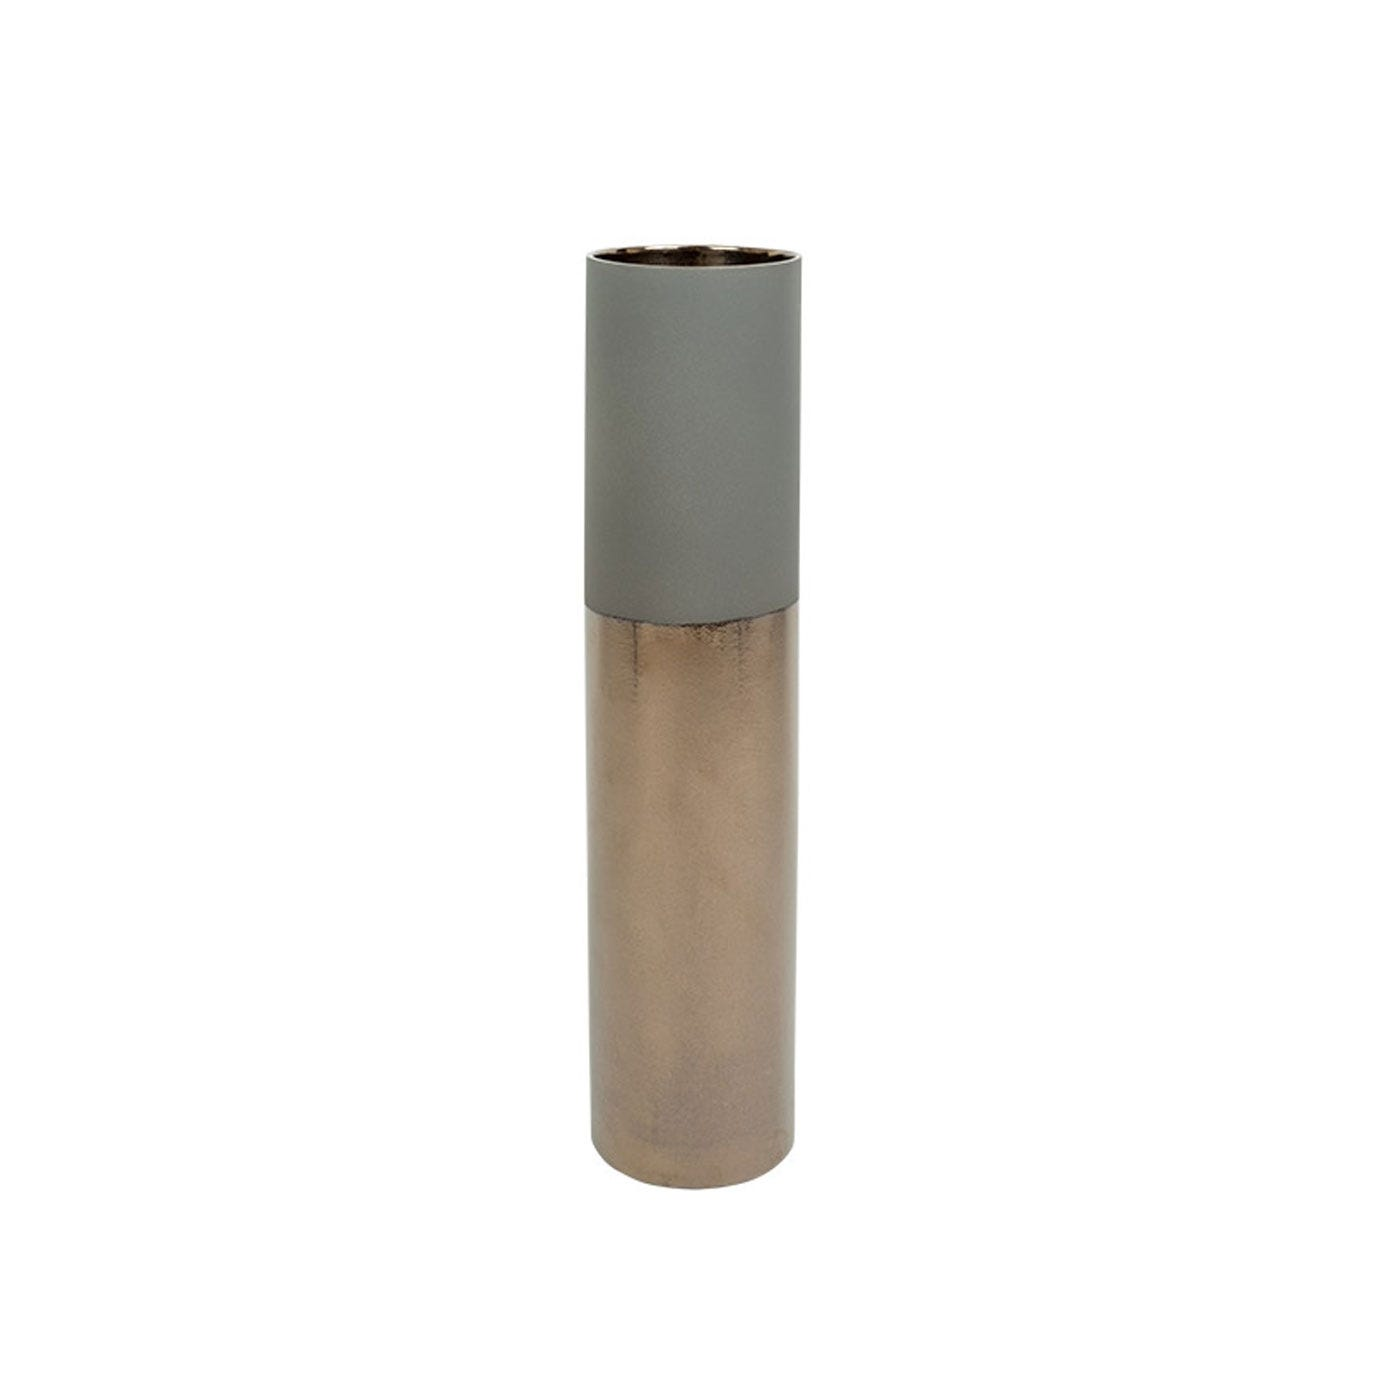 Dual Tone Vase Medium Grey & Metallic